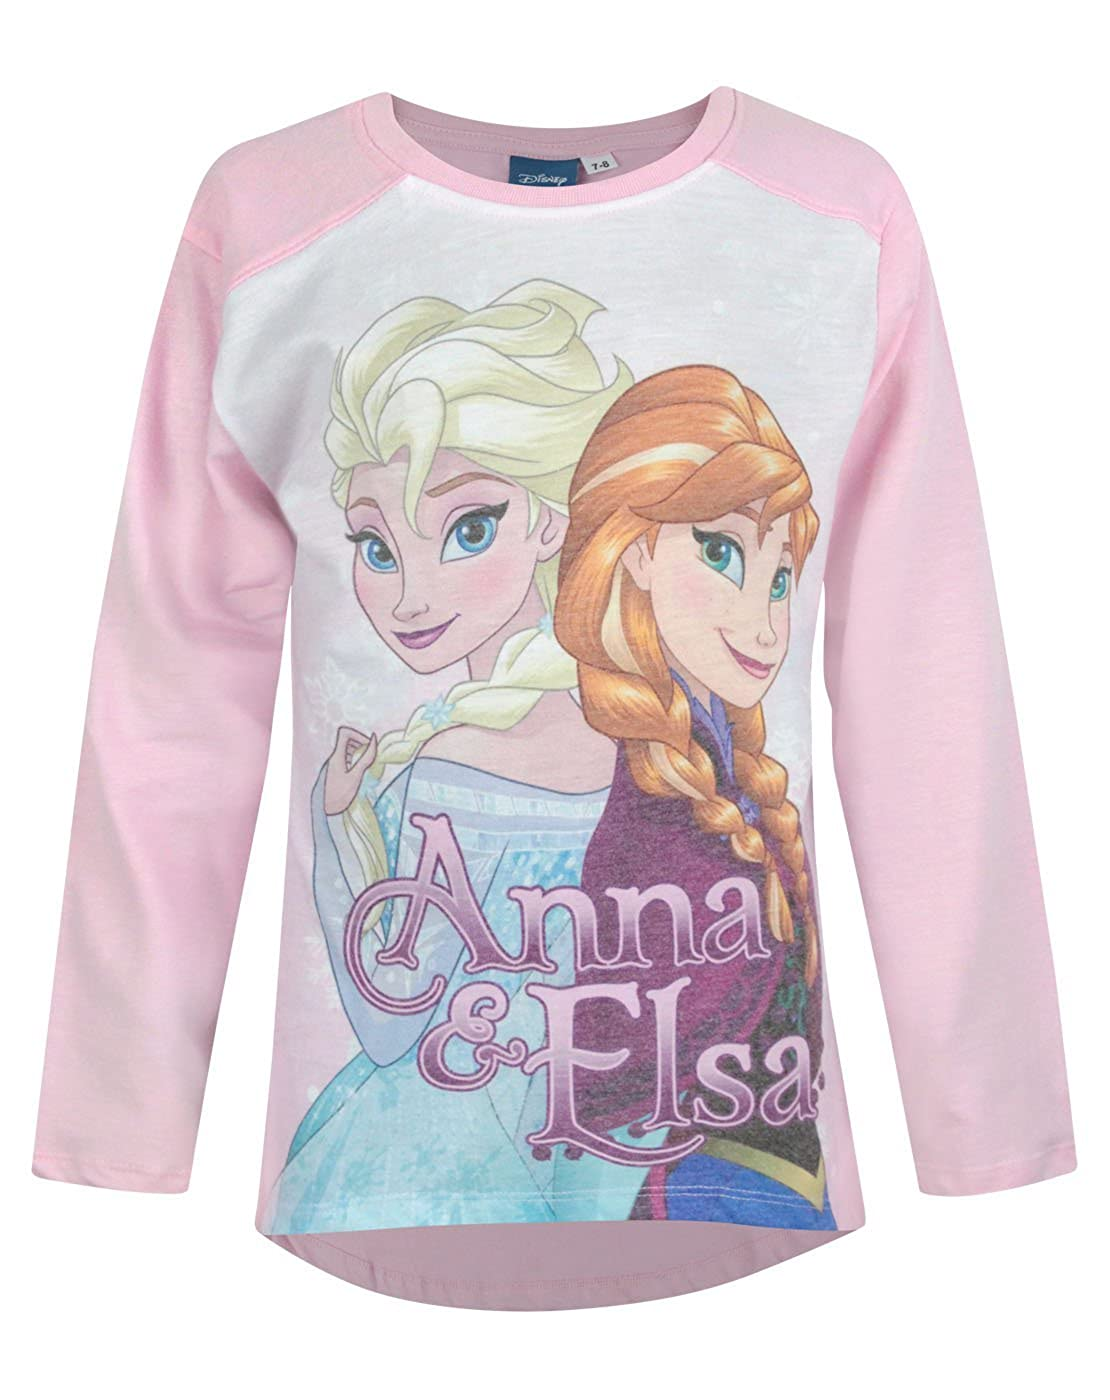 ceb8ac21e Amazon.com: Official Frozen Anna & Elsa Girl's Long Sleeve Top (2-3 Years):  Clothing